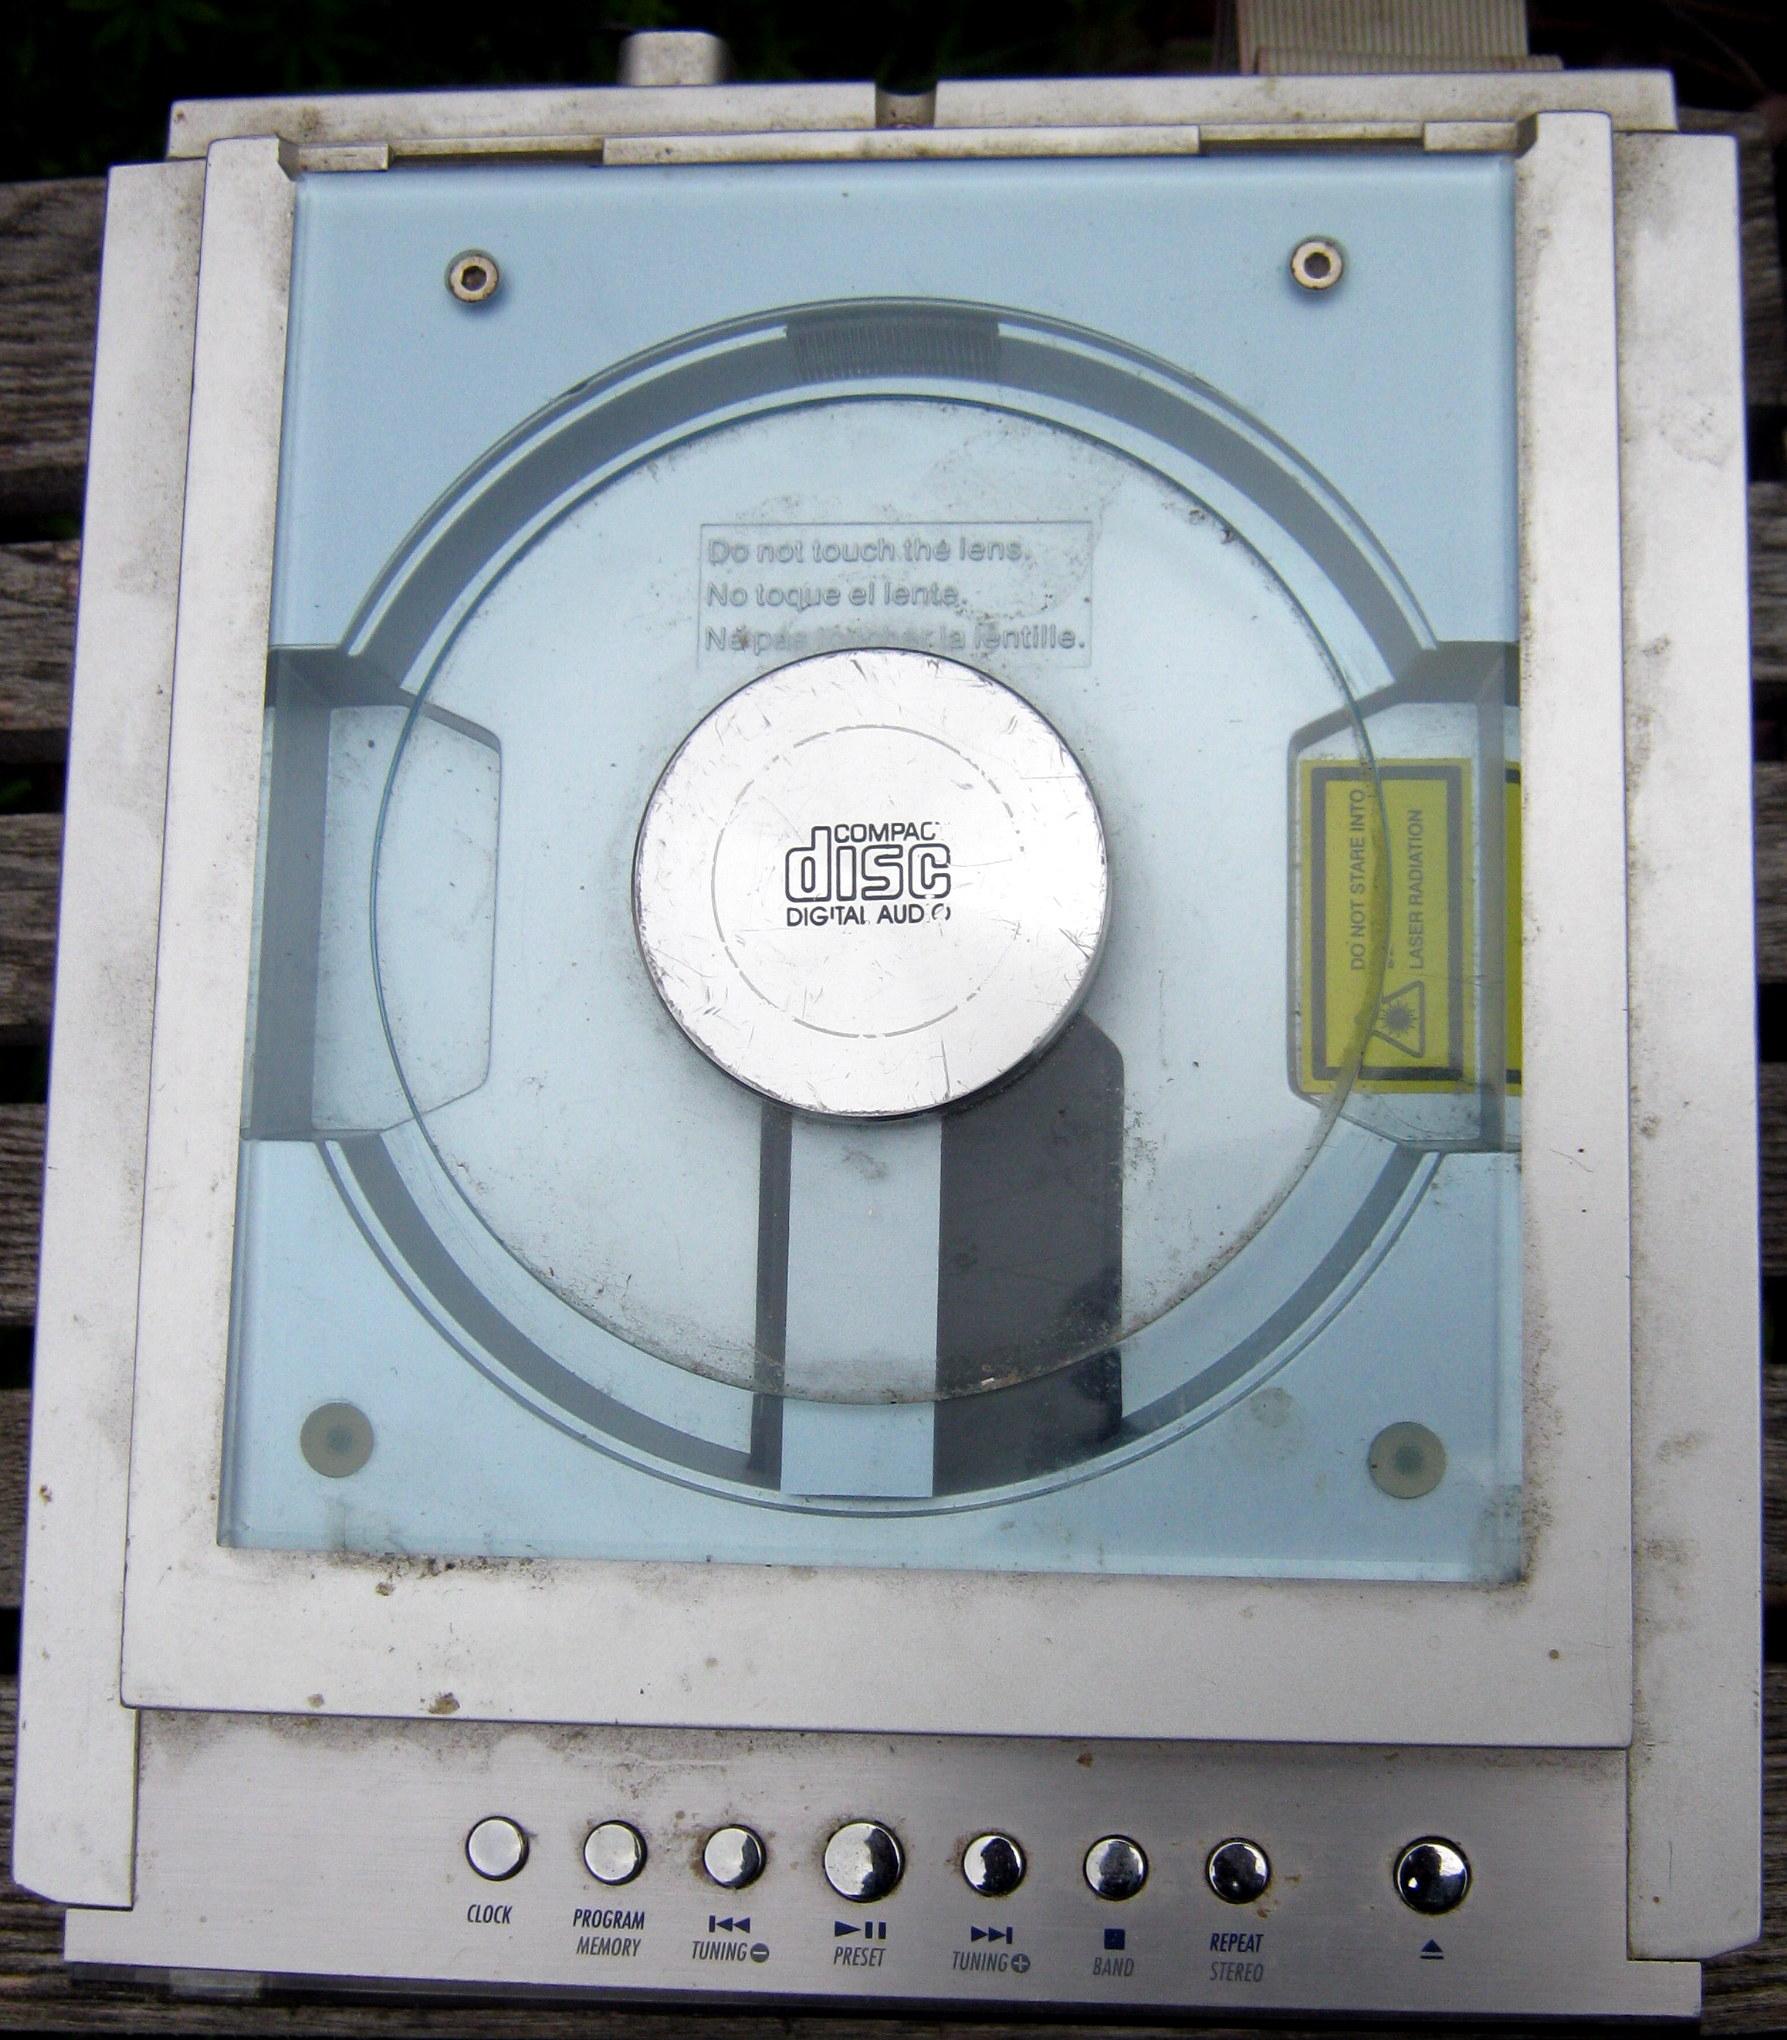 Hitachi AX-M68 Tuner/CD player top